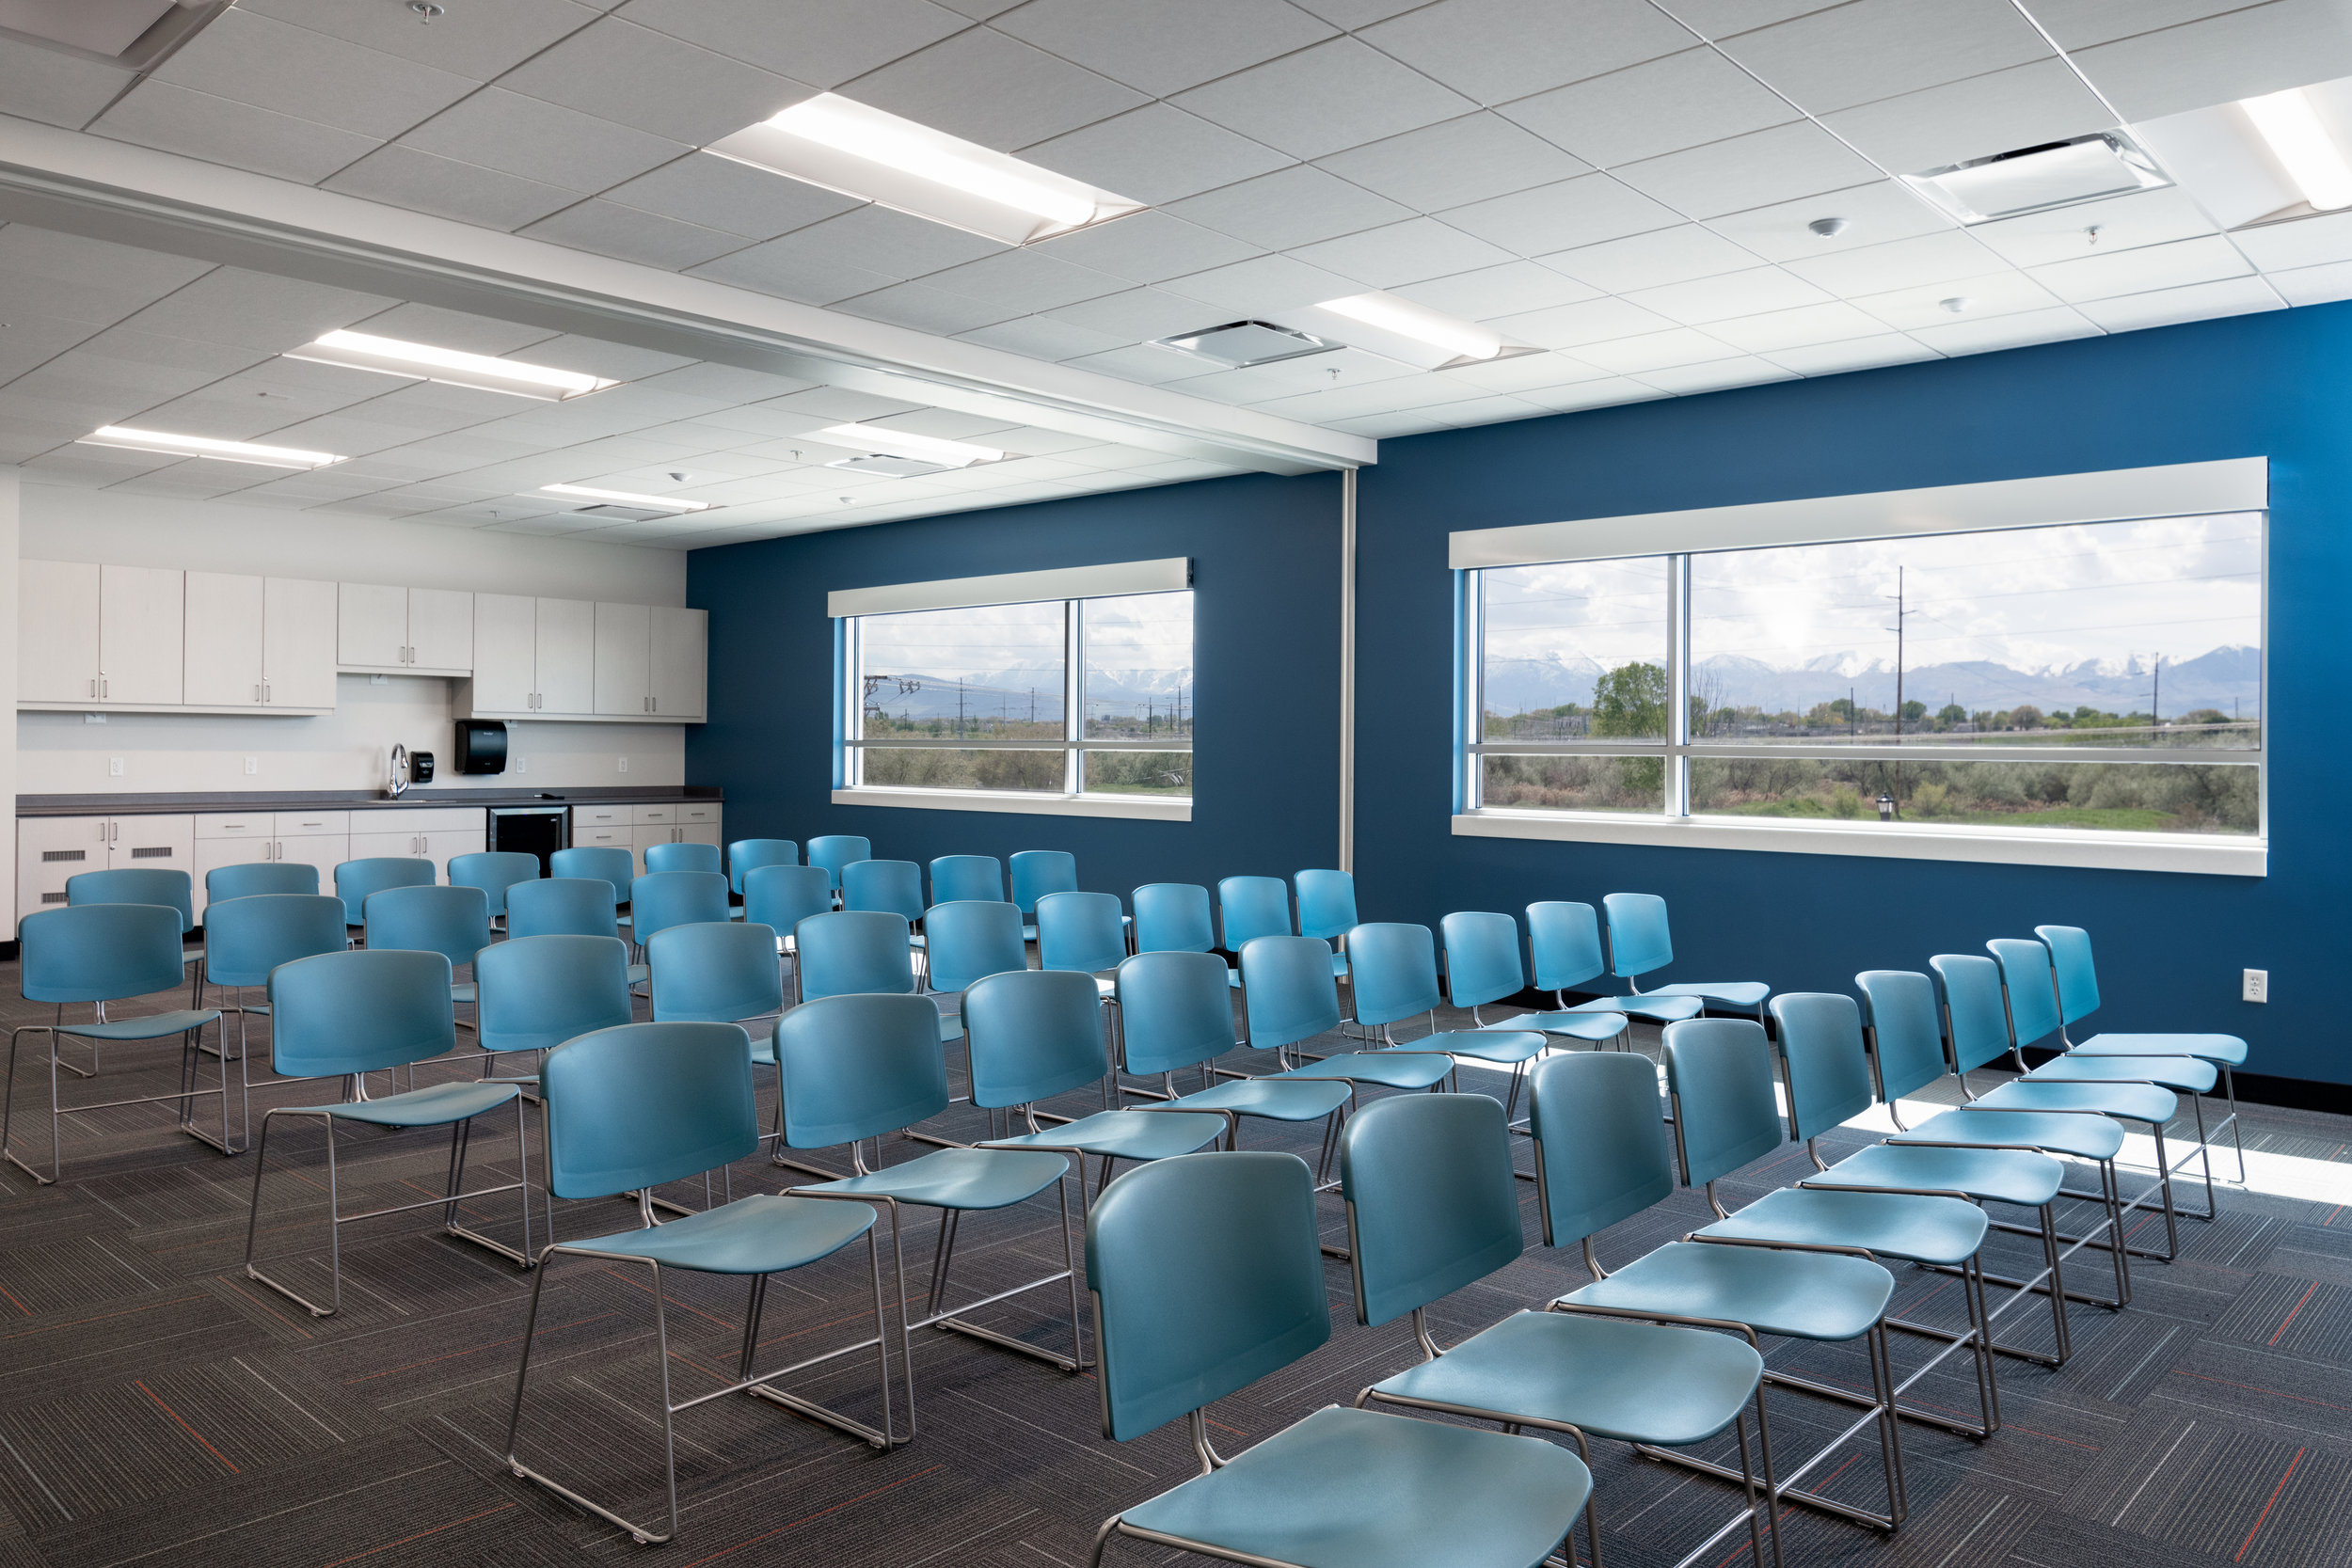 Interior-meeting-room-community-room-web-ready.jpg